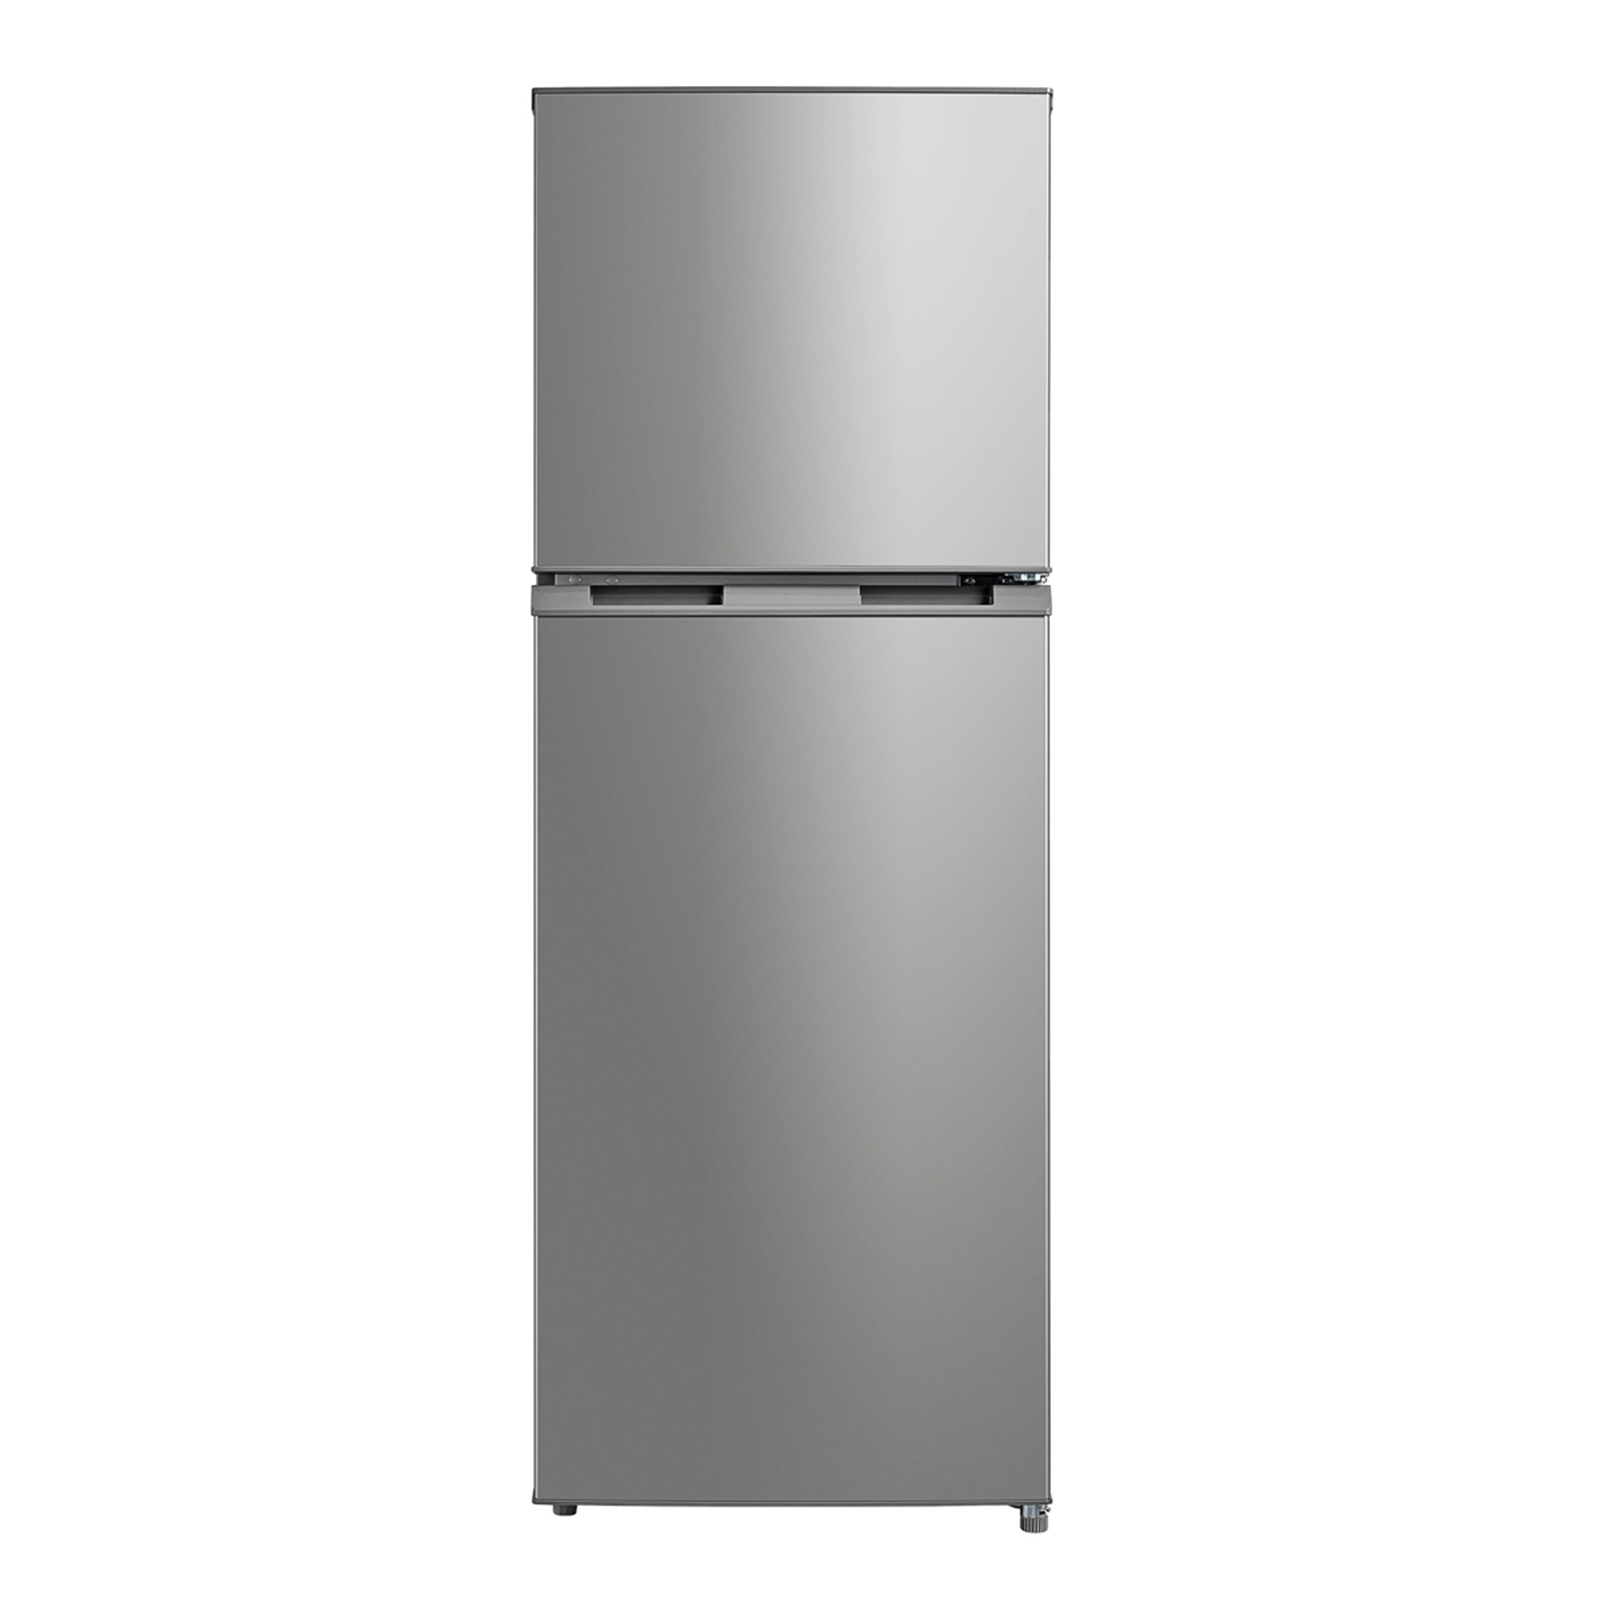 Esatto 239L Top Mount Refrigerator ETM239X